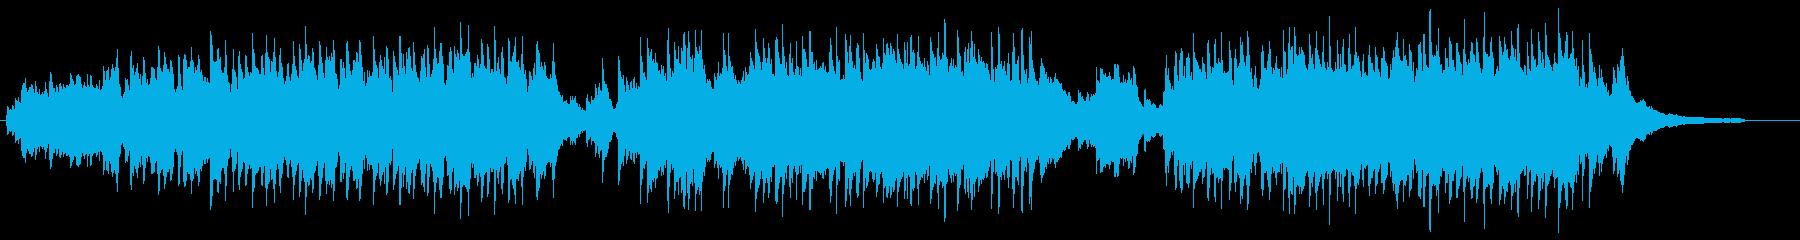 Nostalgic touching romantic piano's reproduced waveform